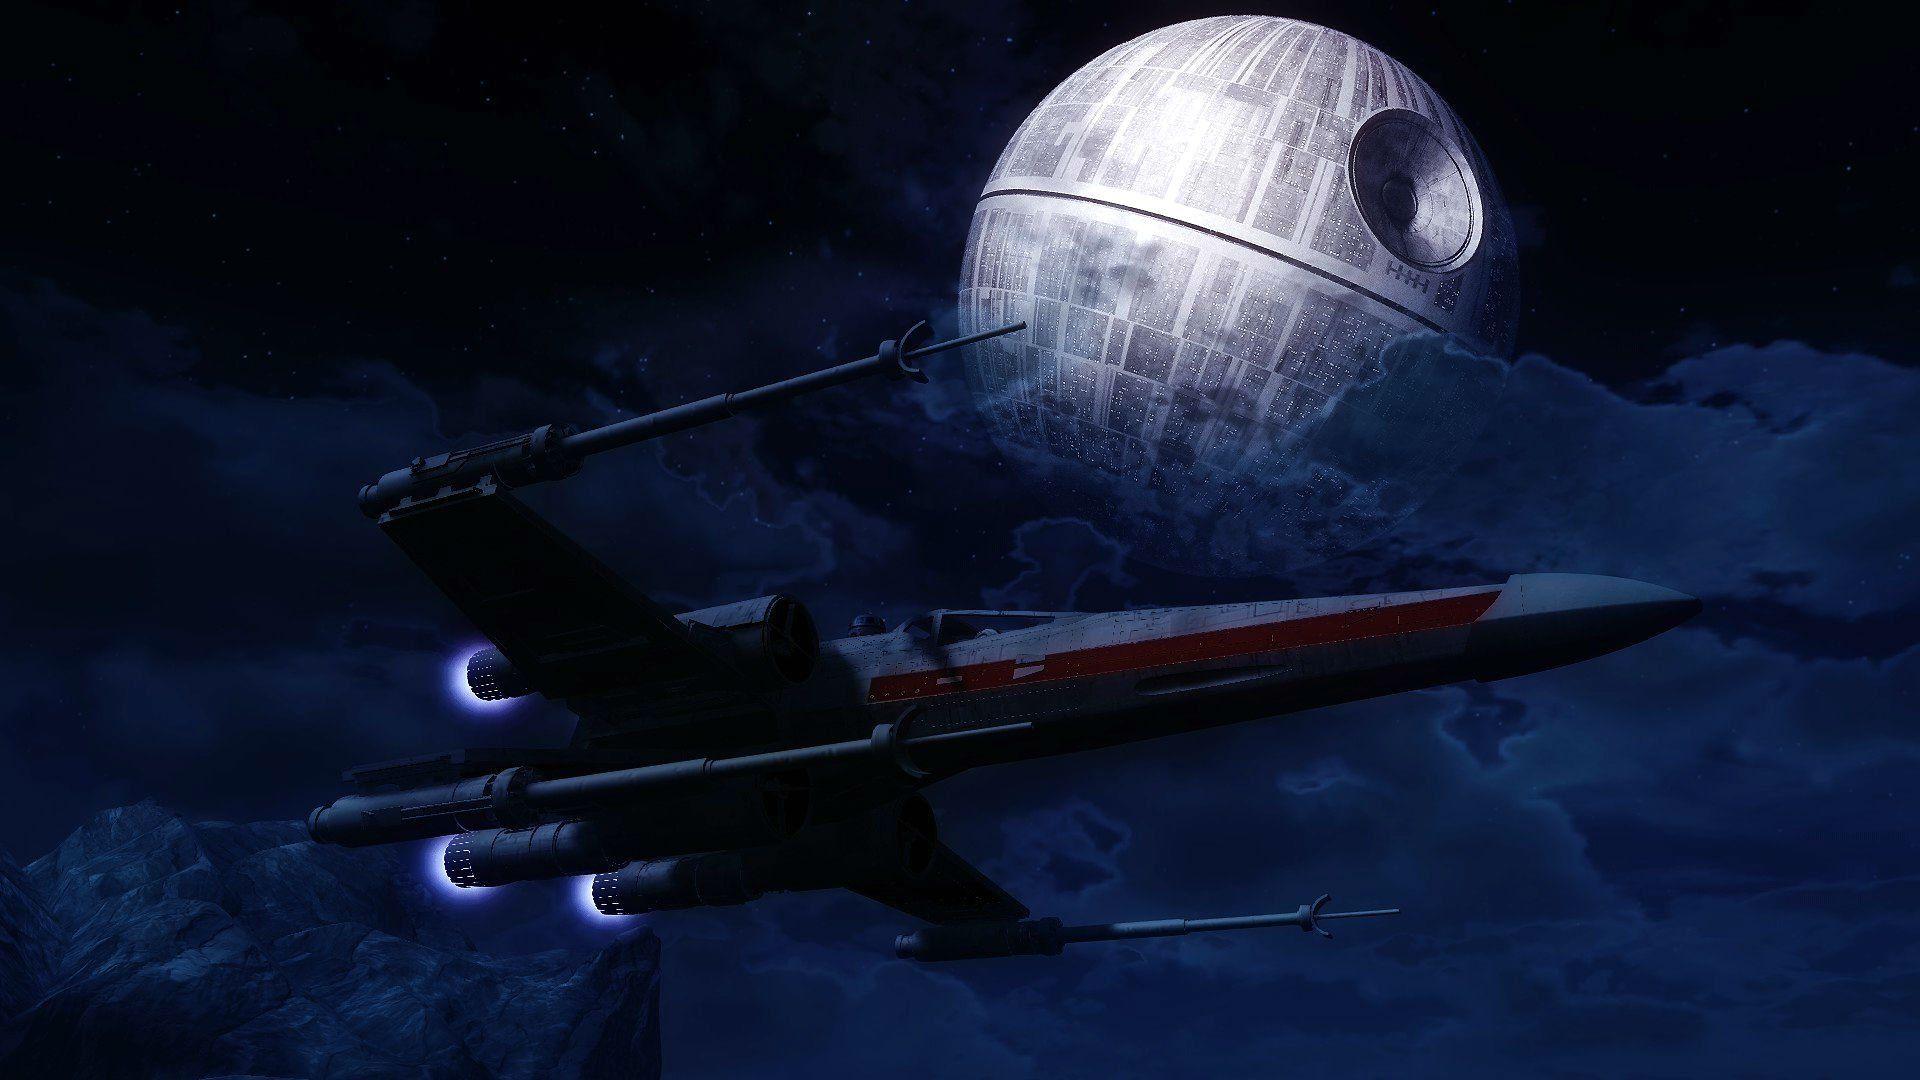 Star Wars Screensaver Nice Wallpaper